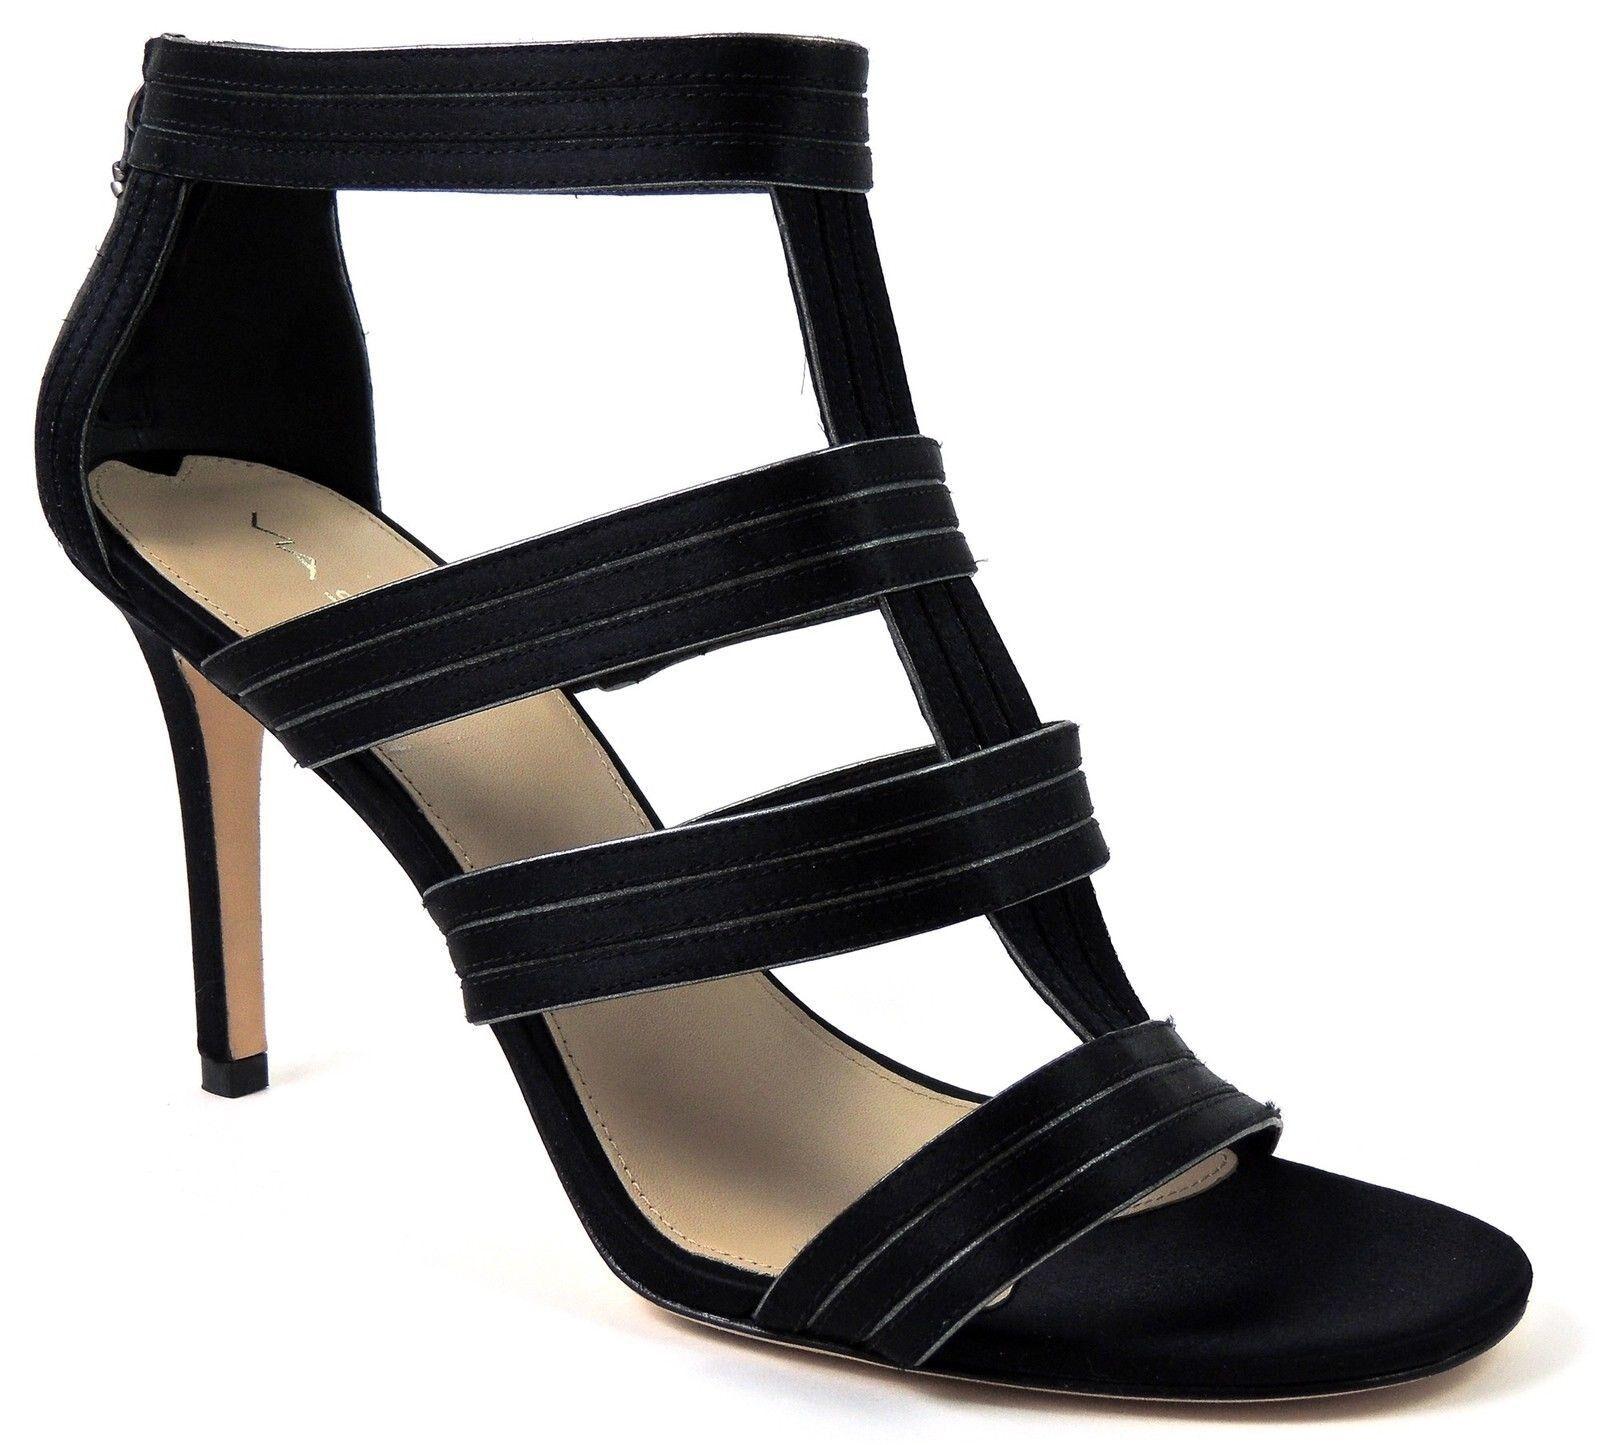 Via Spiga Mujer Melanie T-Strap Sandalias Granito Negro Tamaño 10 M